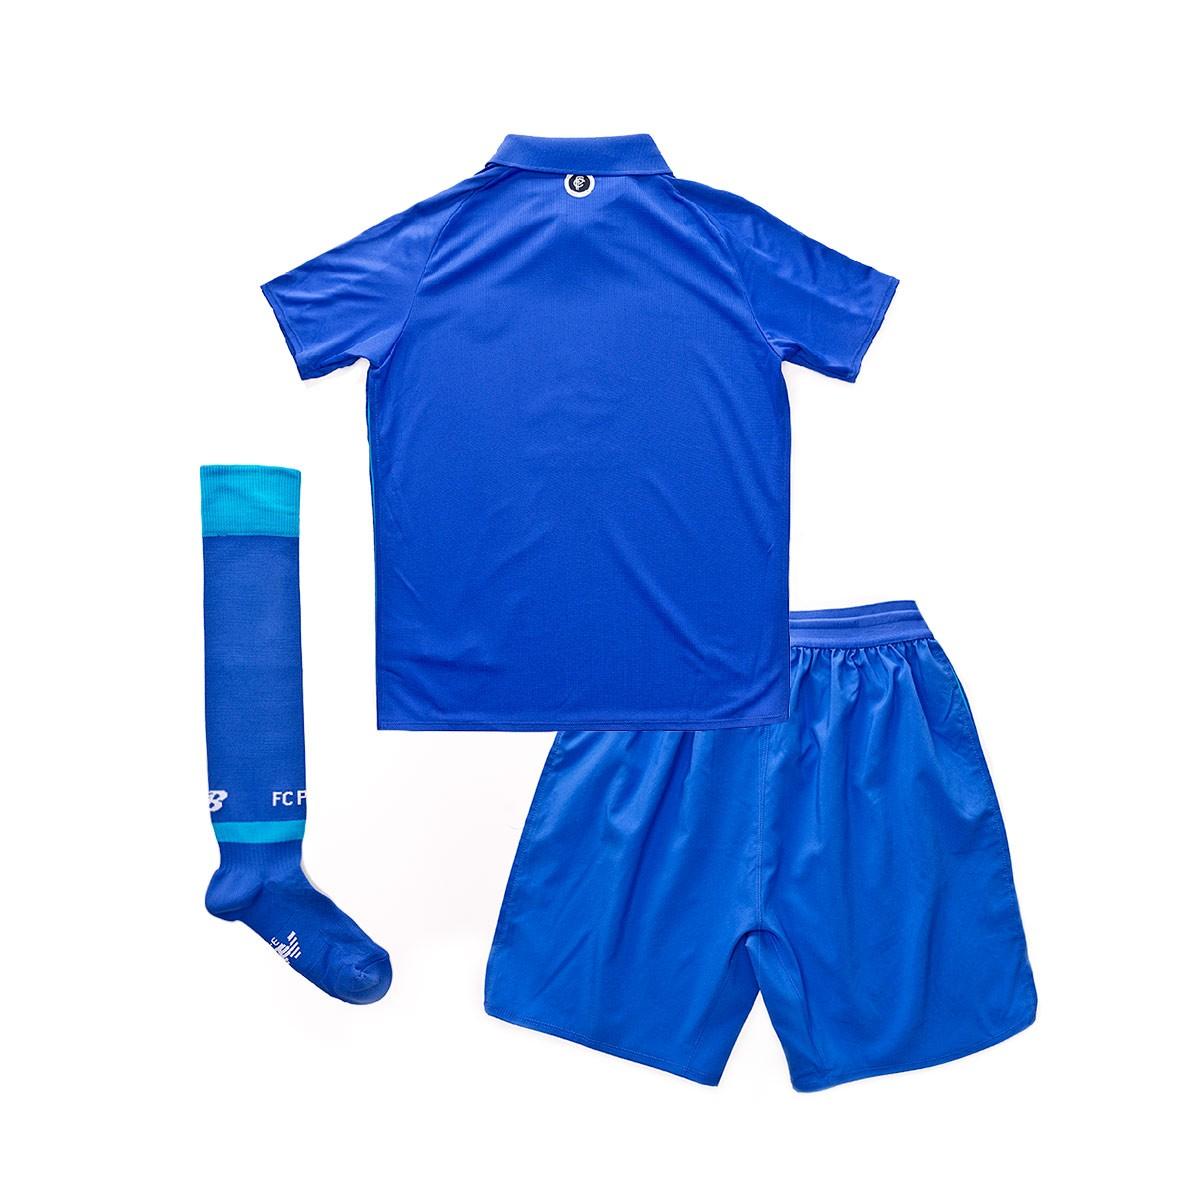 new style a3ae8 6b2f8 Conjunto FC Porto Tercera Equipación 2018-2019 Niño Azul